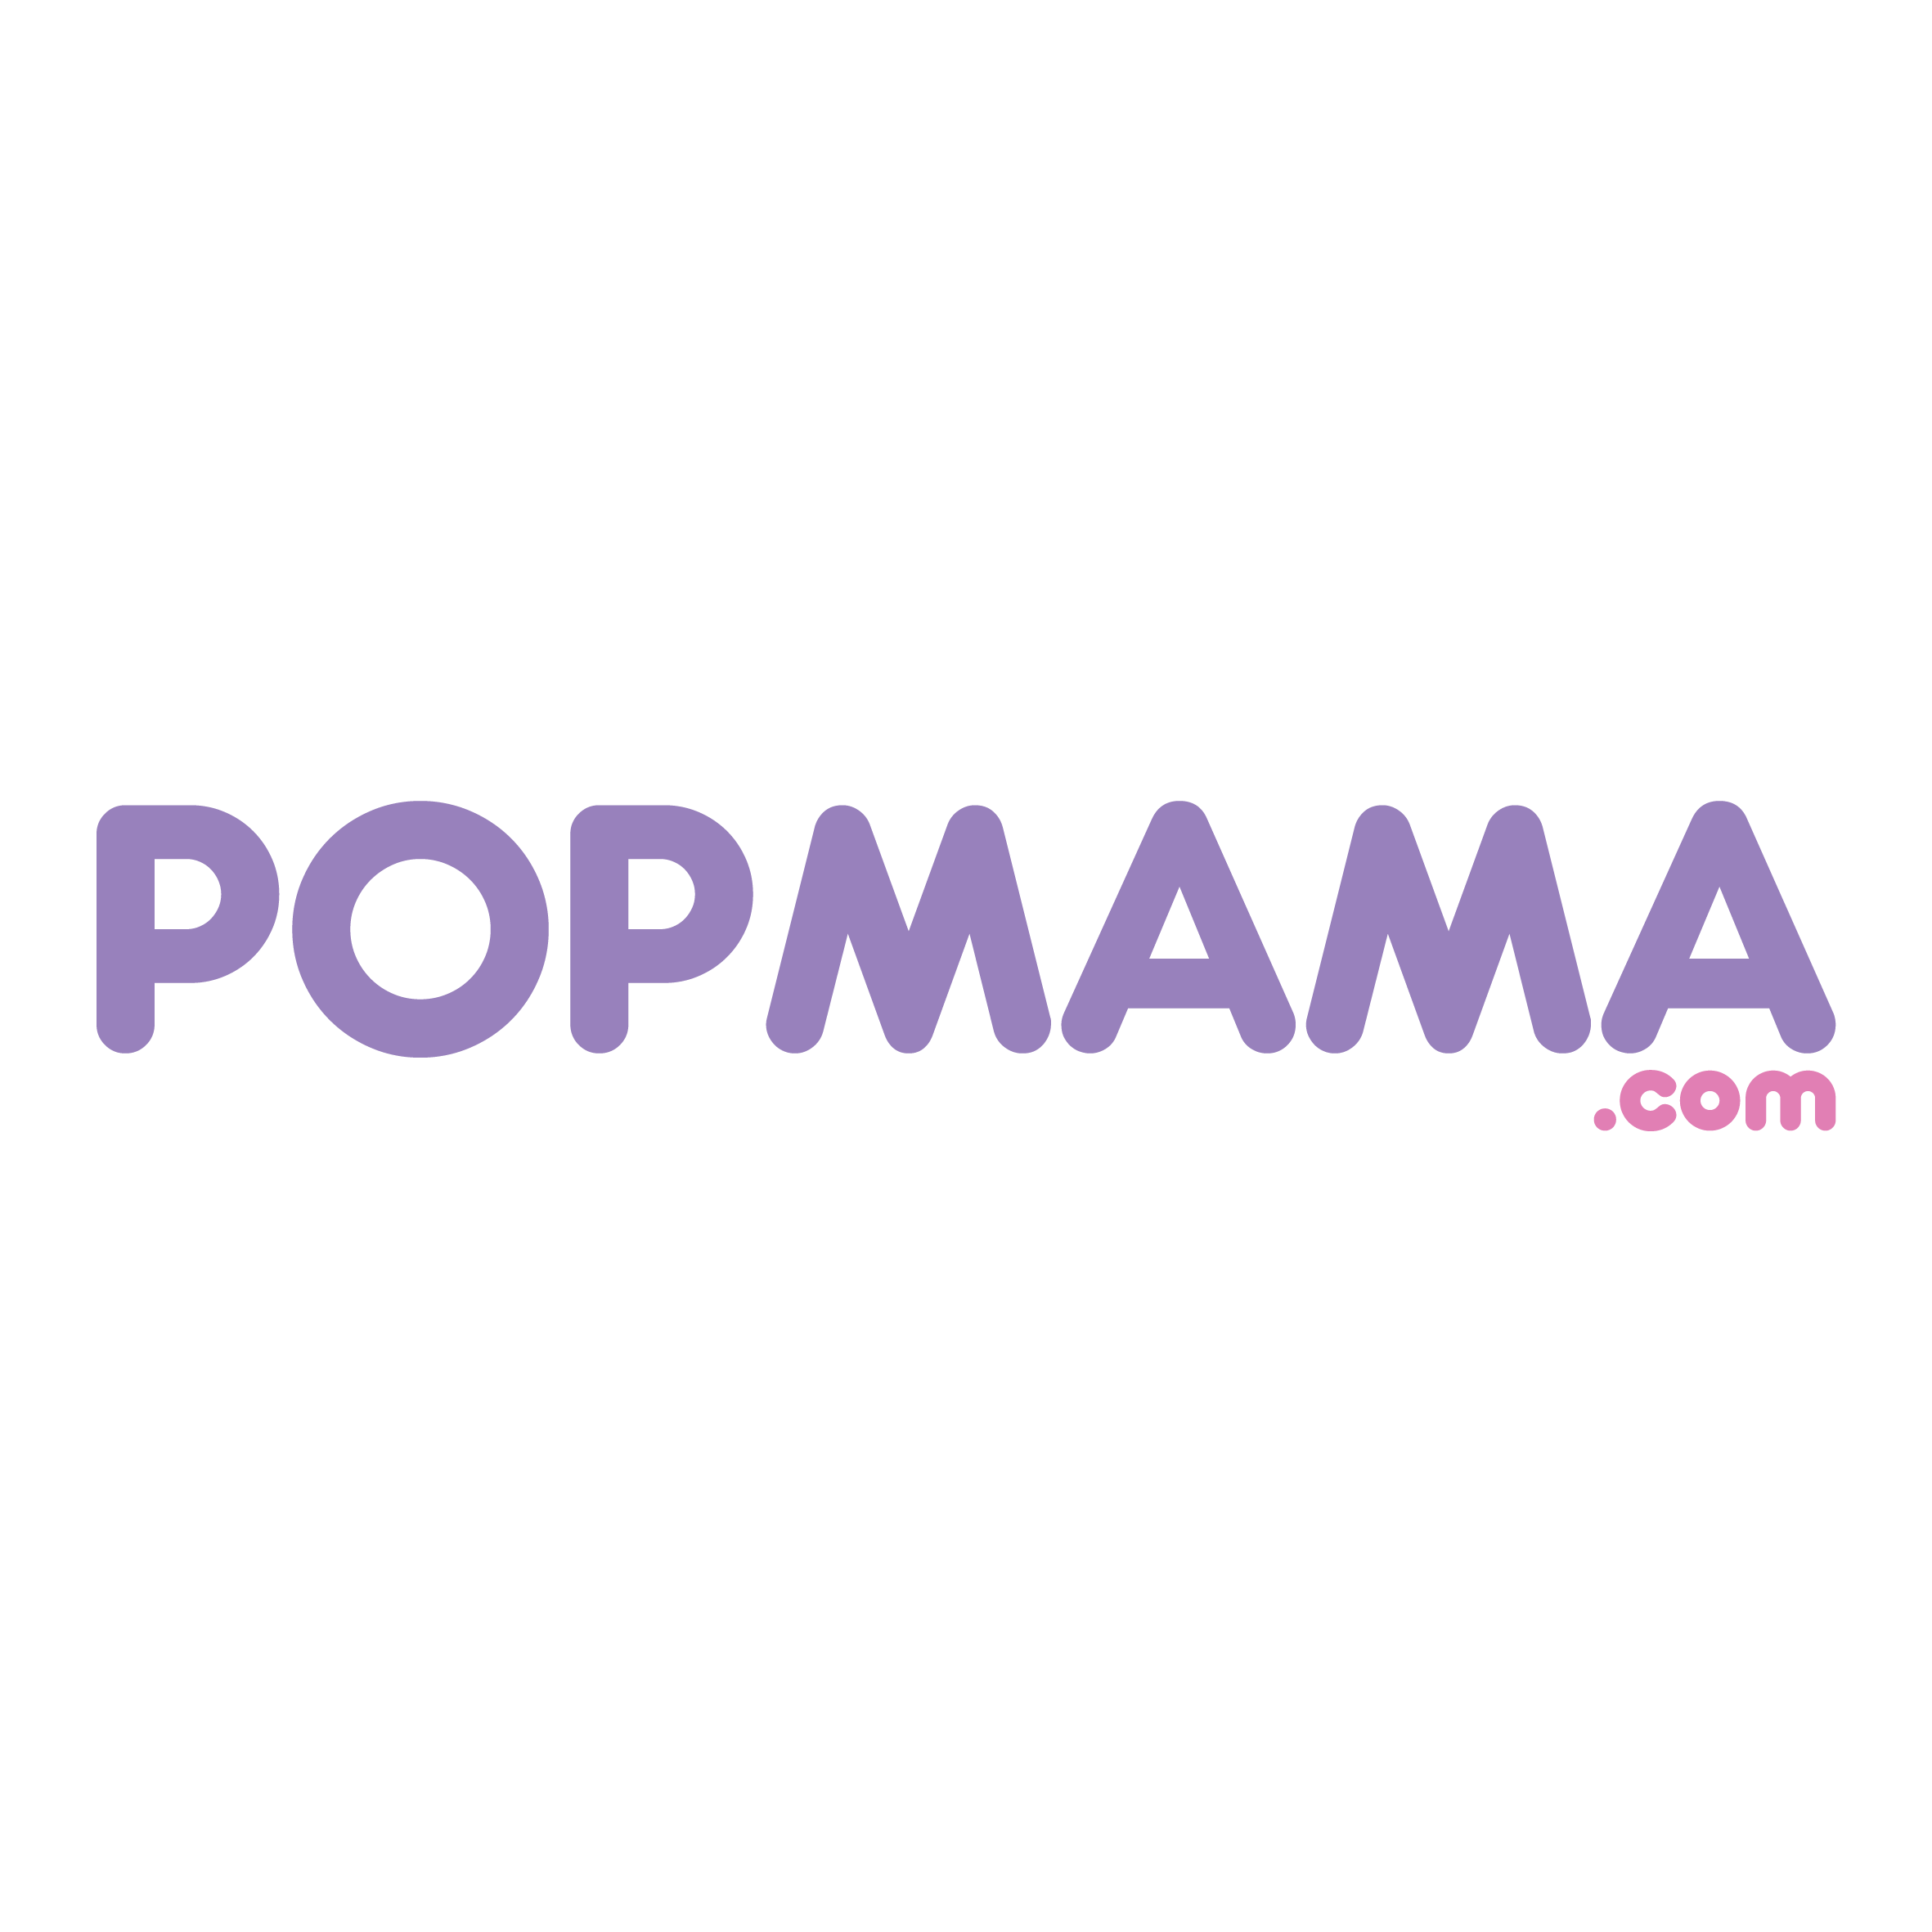 Logo Popmama.png